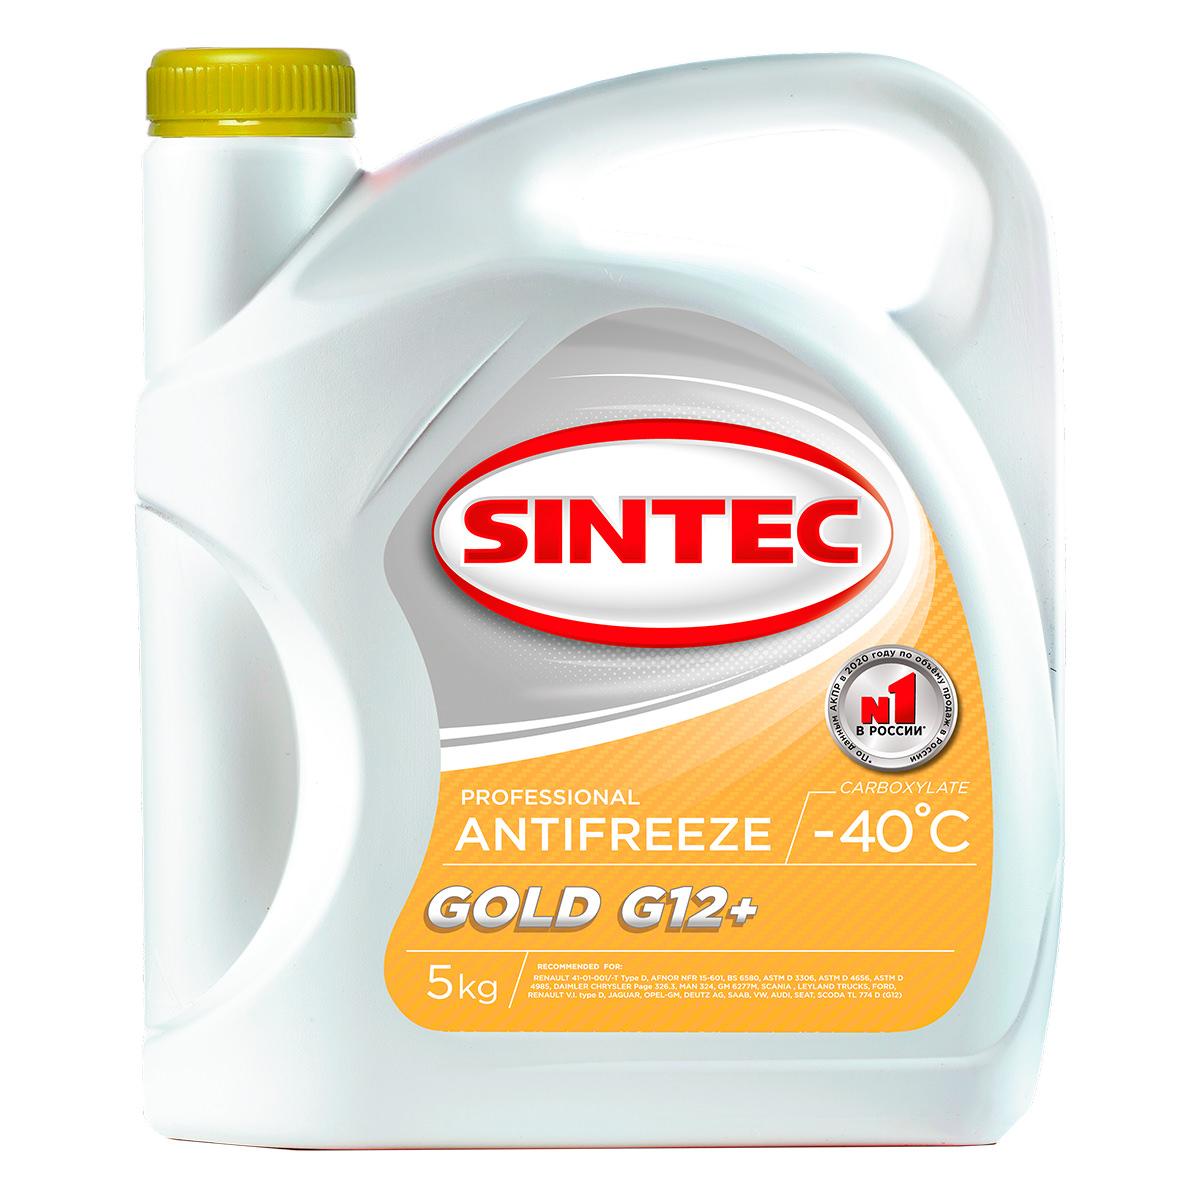 SINTEC ANTIFREEZE GOLD G12+ (-40)